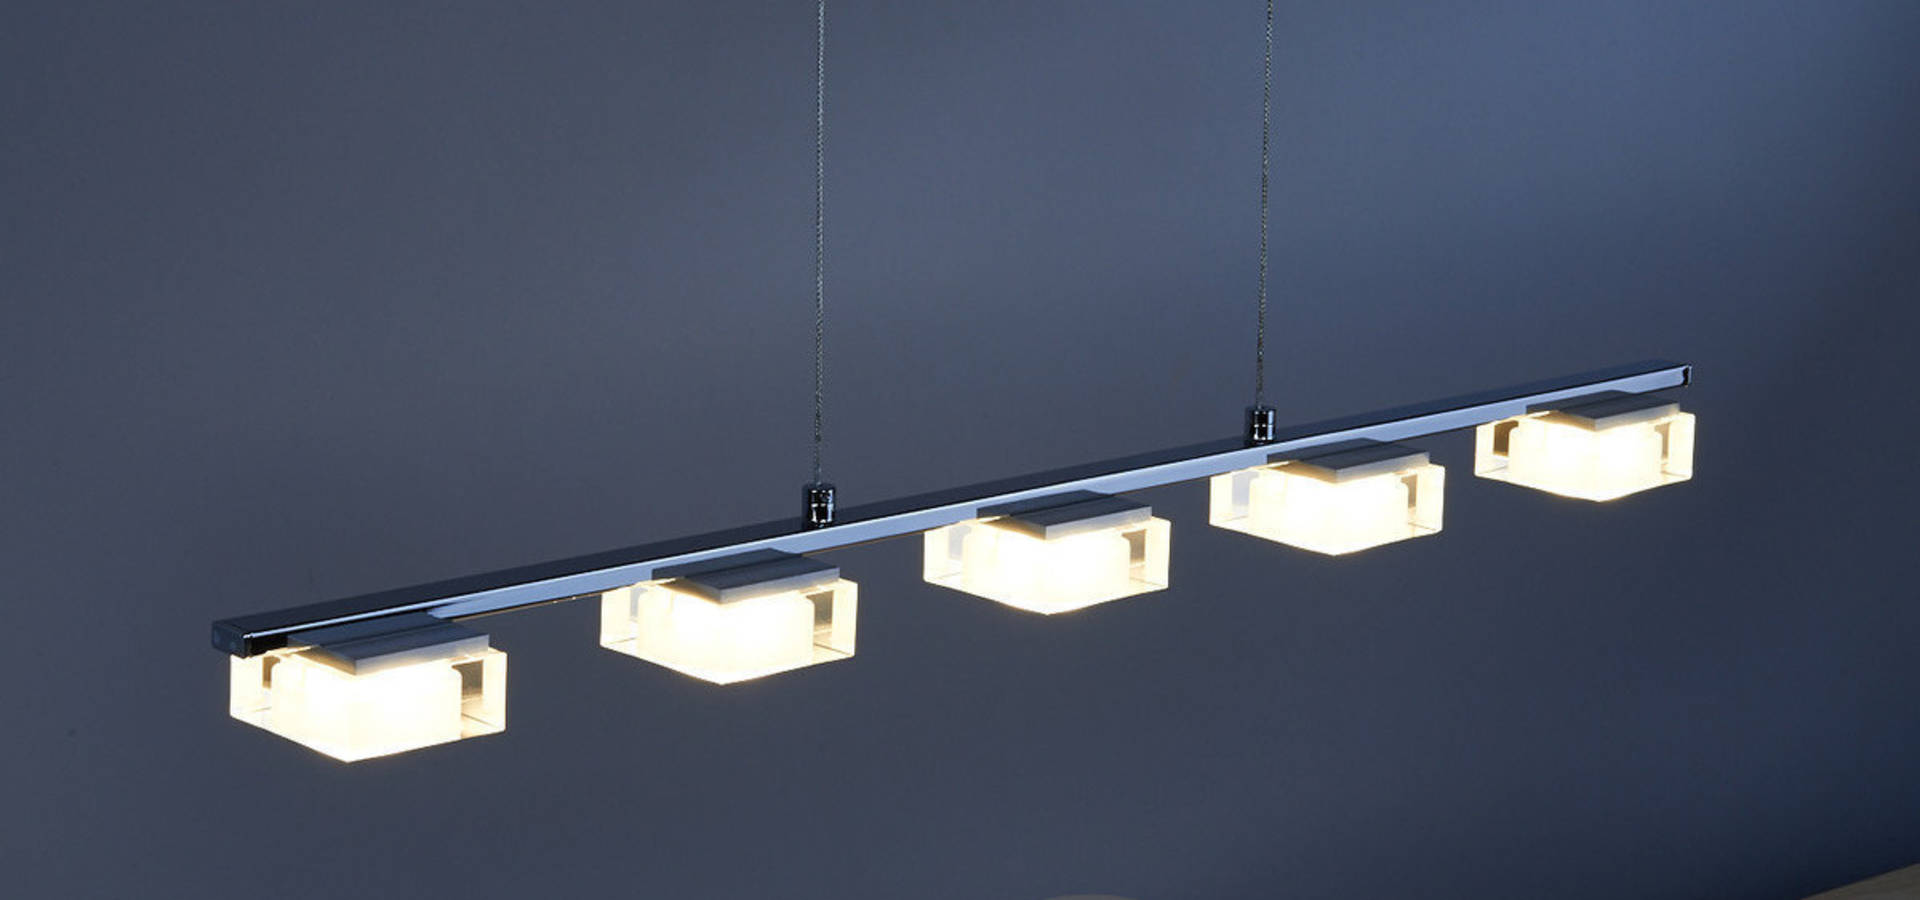 beleuchtung in schlitz homify. Black Bedroom Furniture Sets. Home Design Ideas